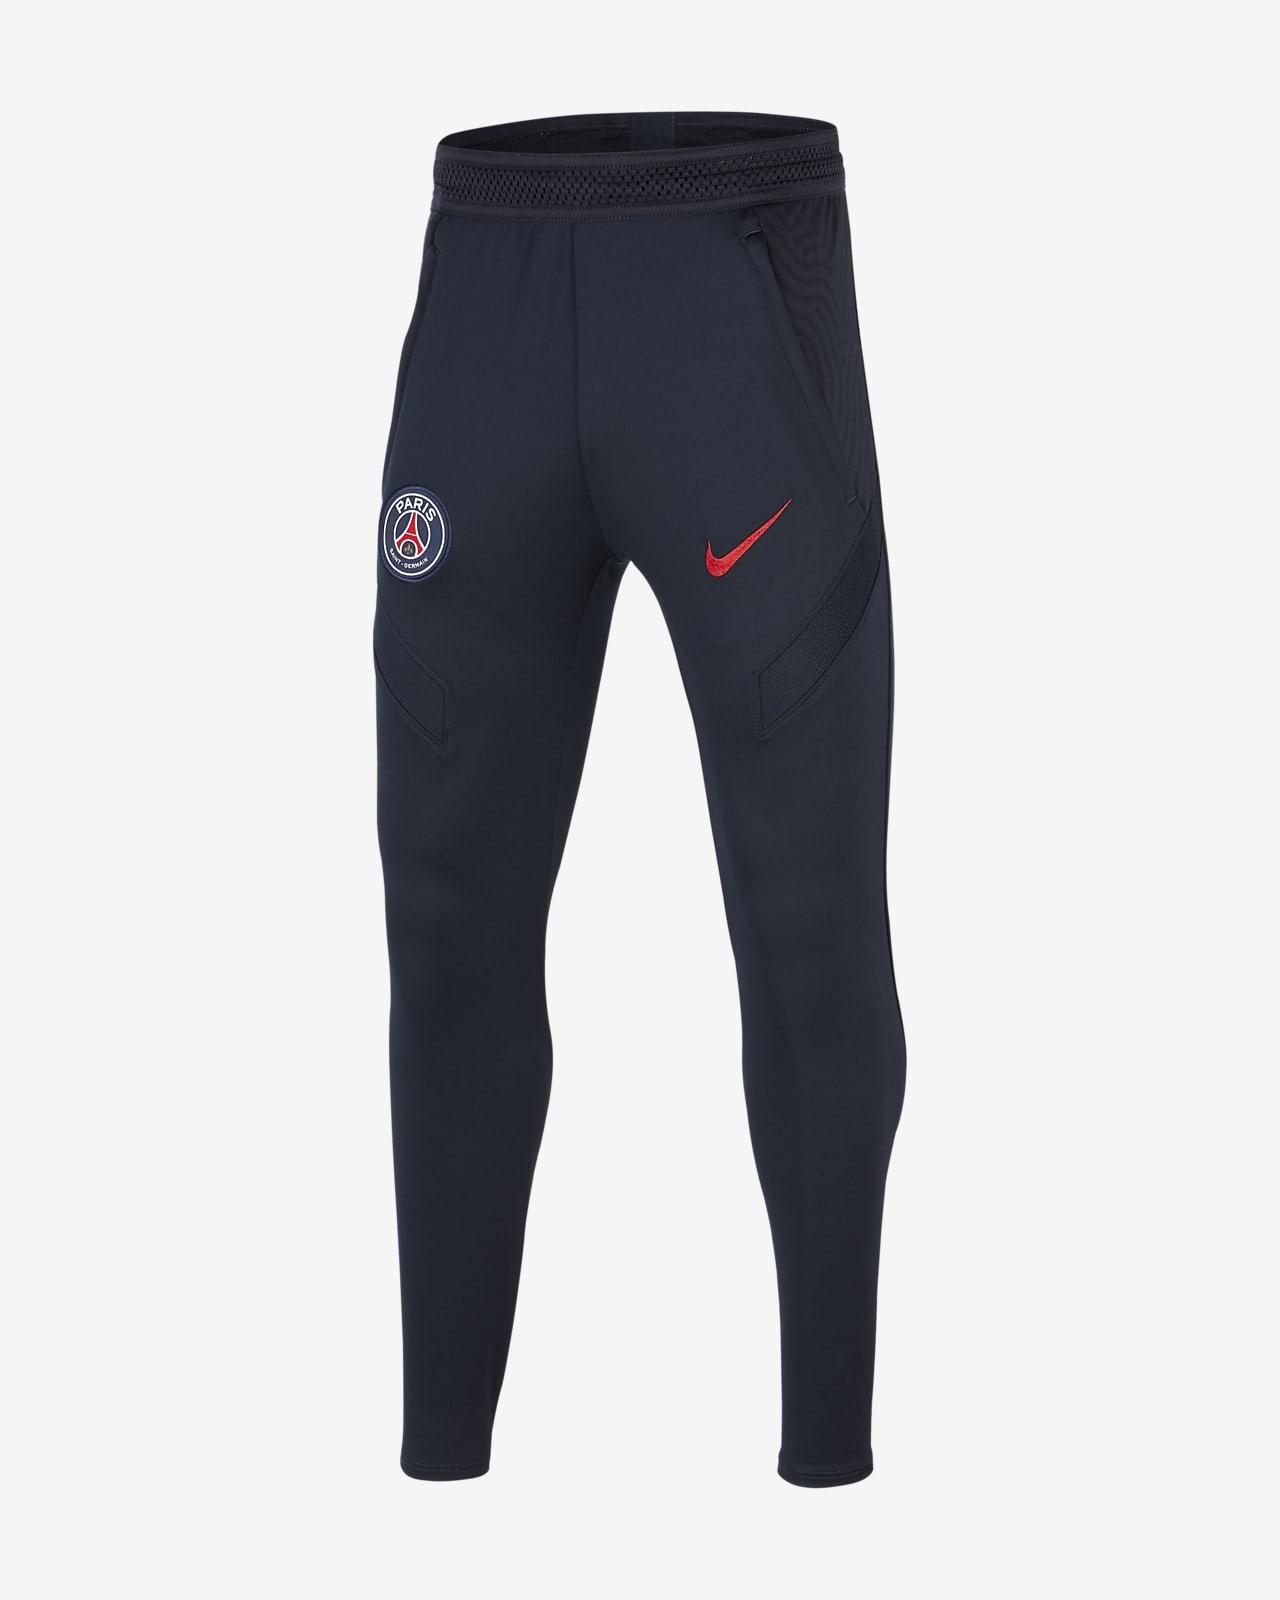 Pantalones de fútbol para niños talla grande Paris Saint-Germain Strike